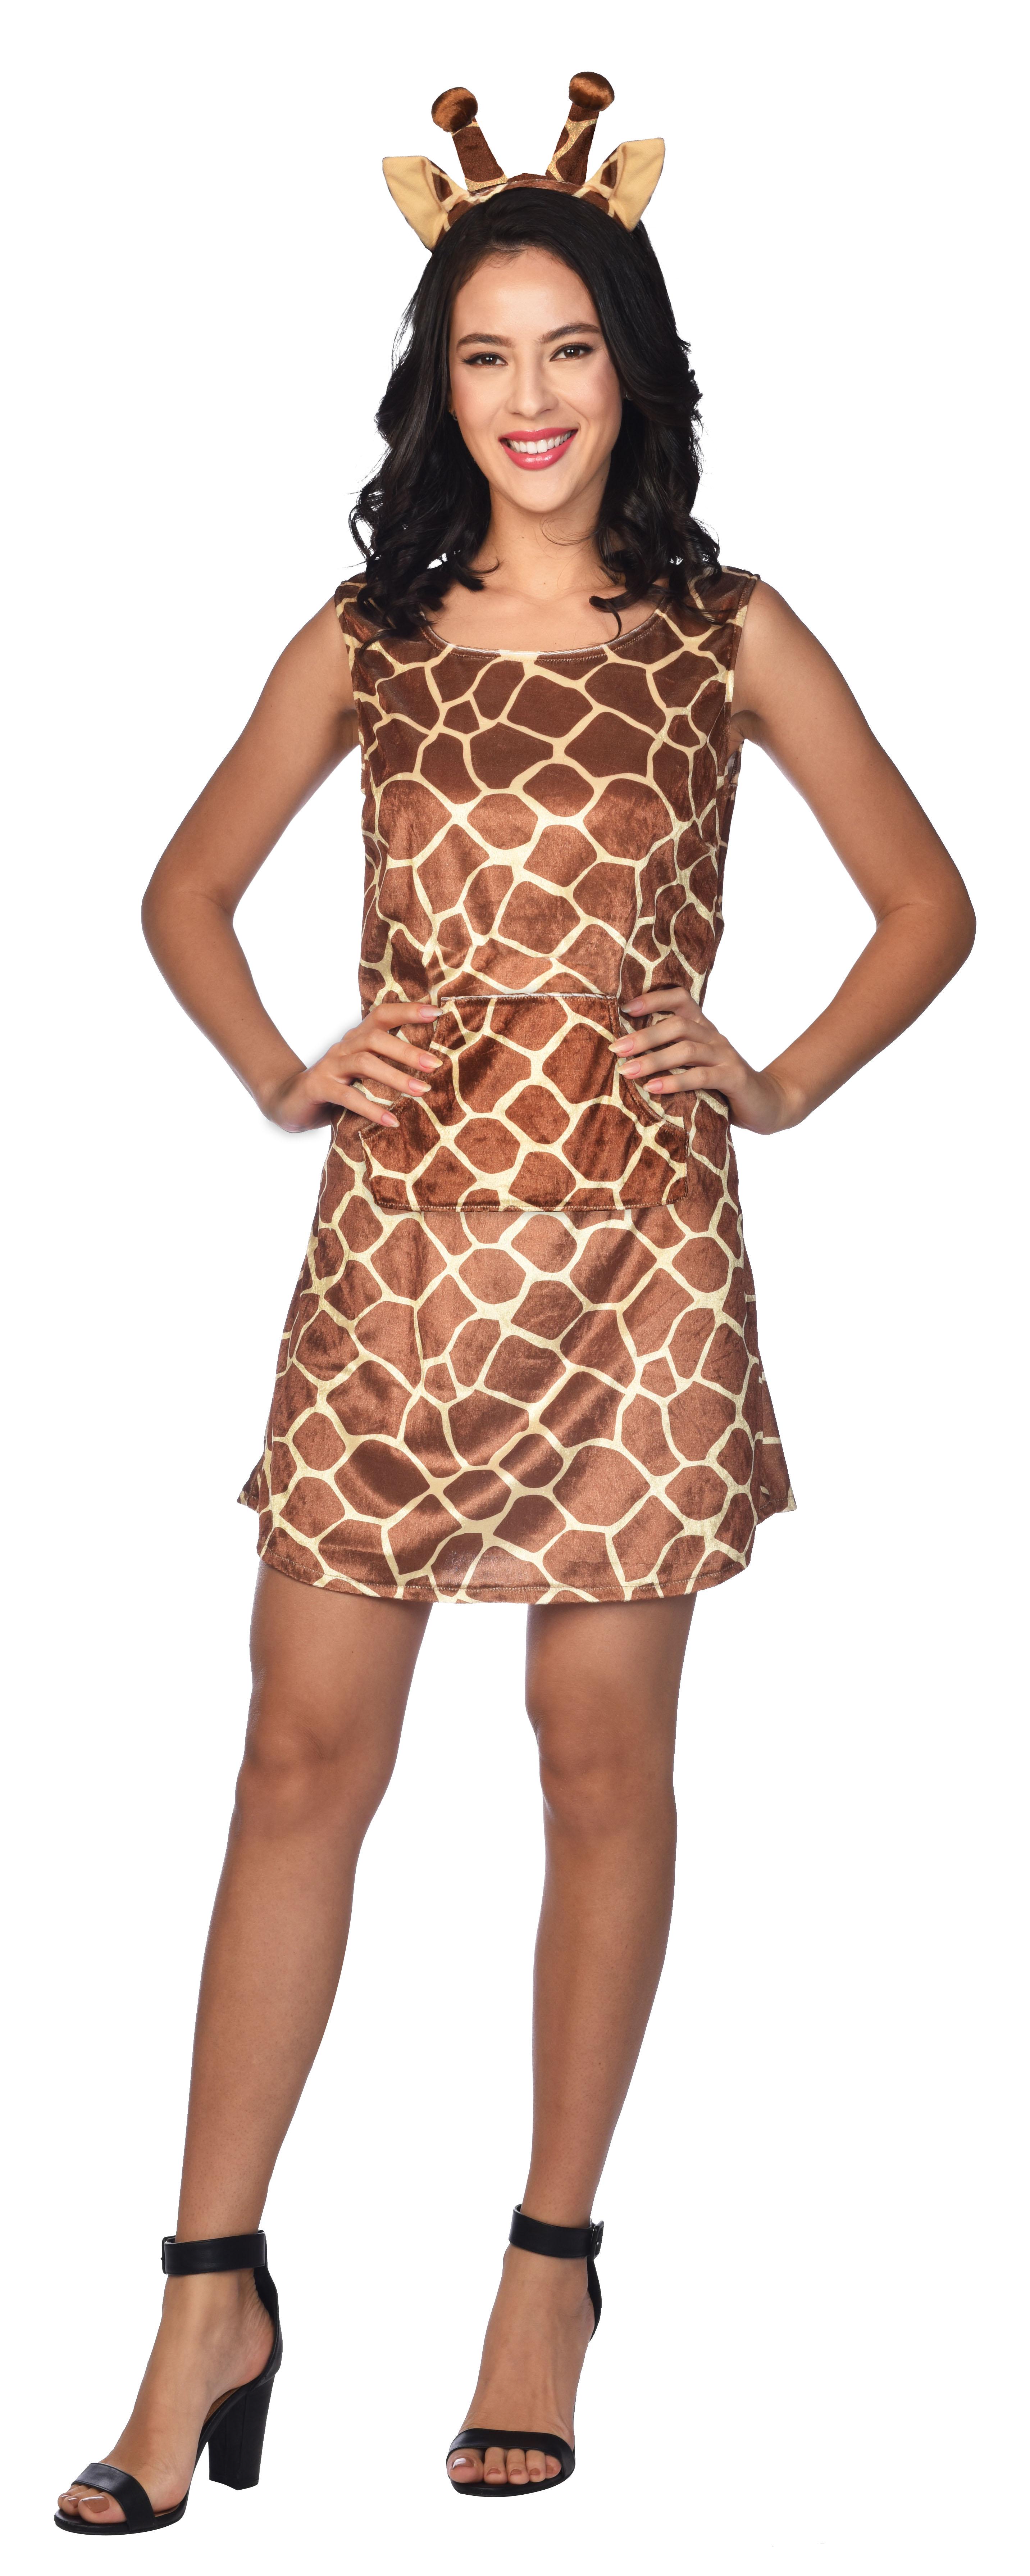 Indexbild 22 - Adult Ladies Zoo Safari Animal Giraffe Lady Fancy Dress Costume Womens Outfit